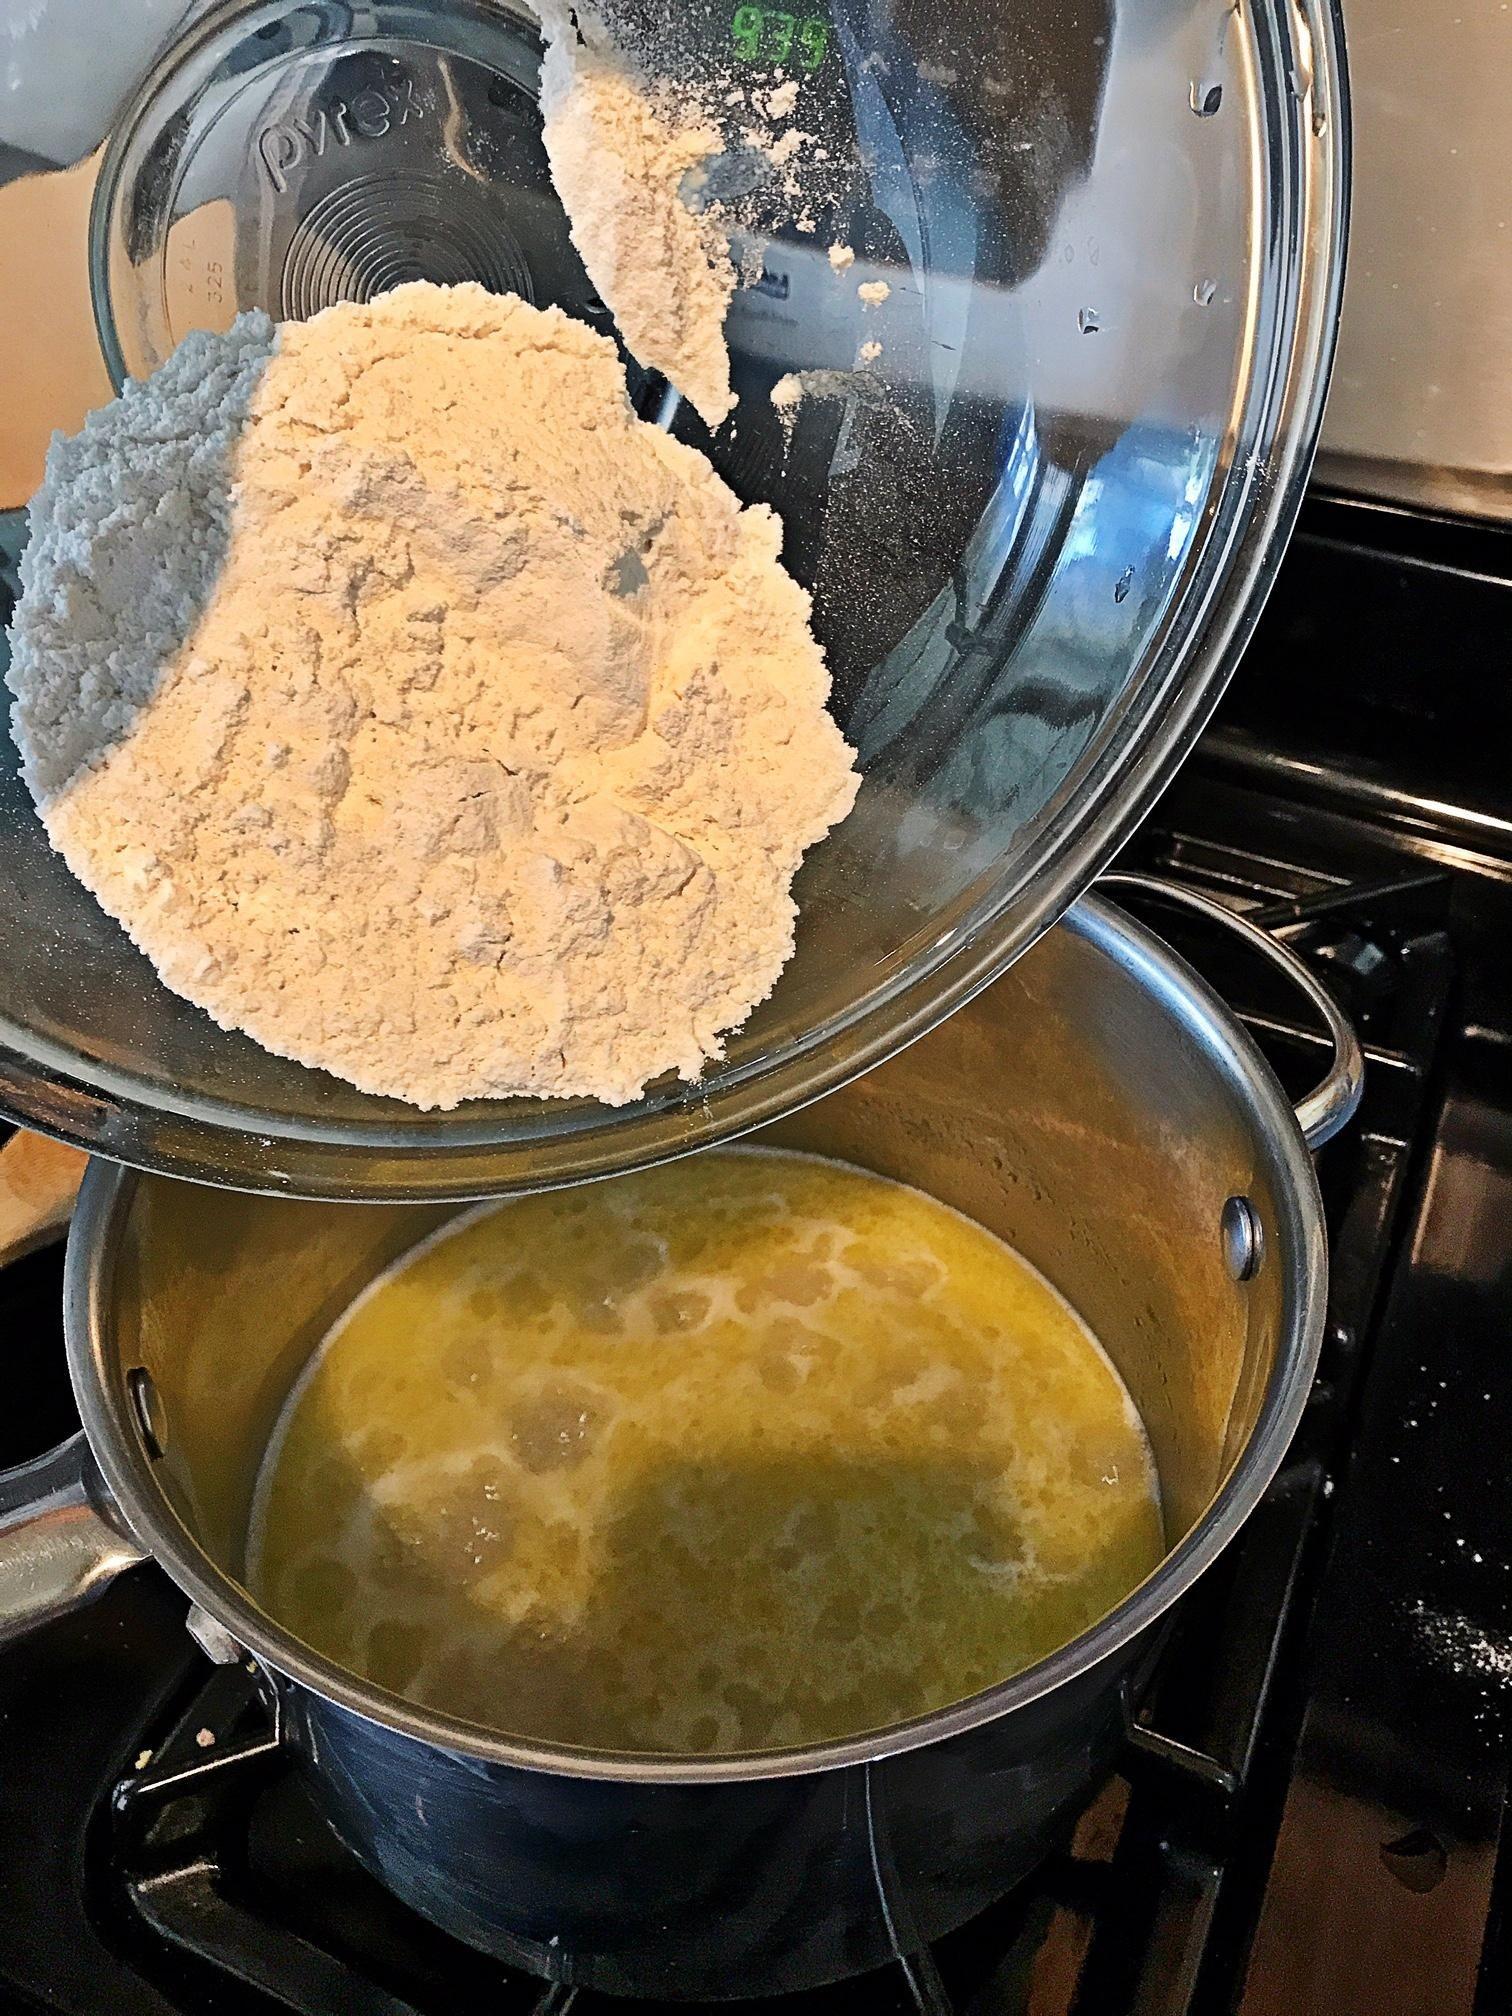 cruller dough